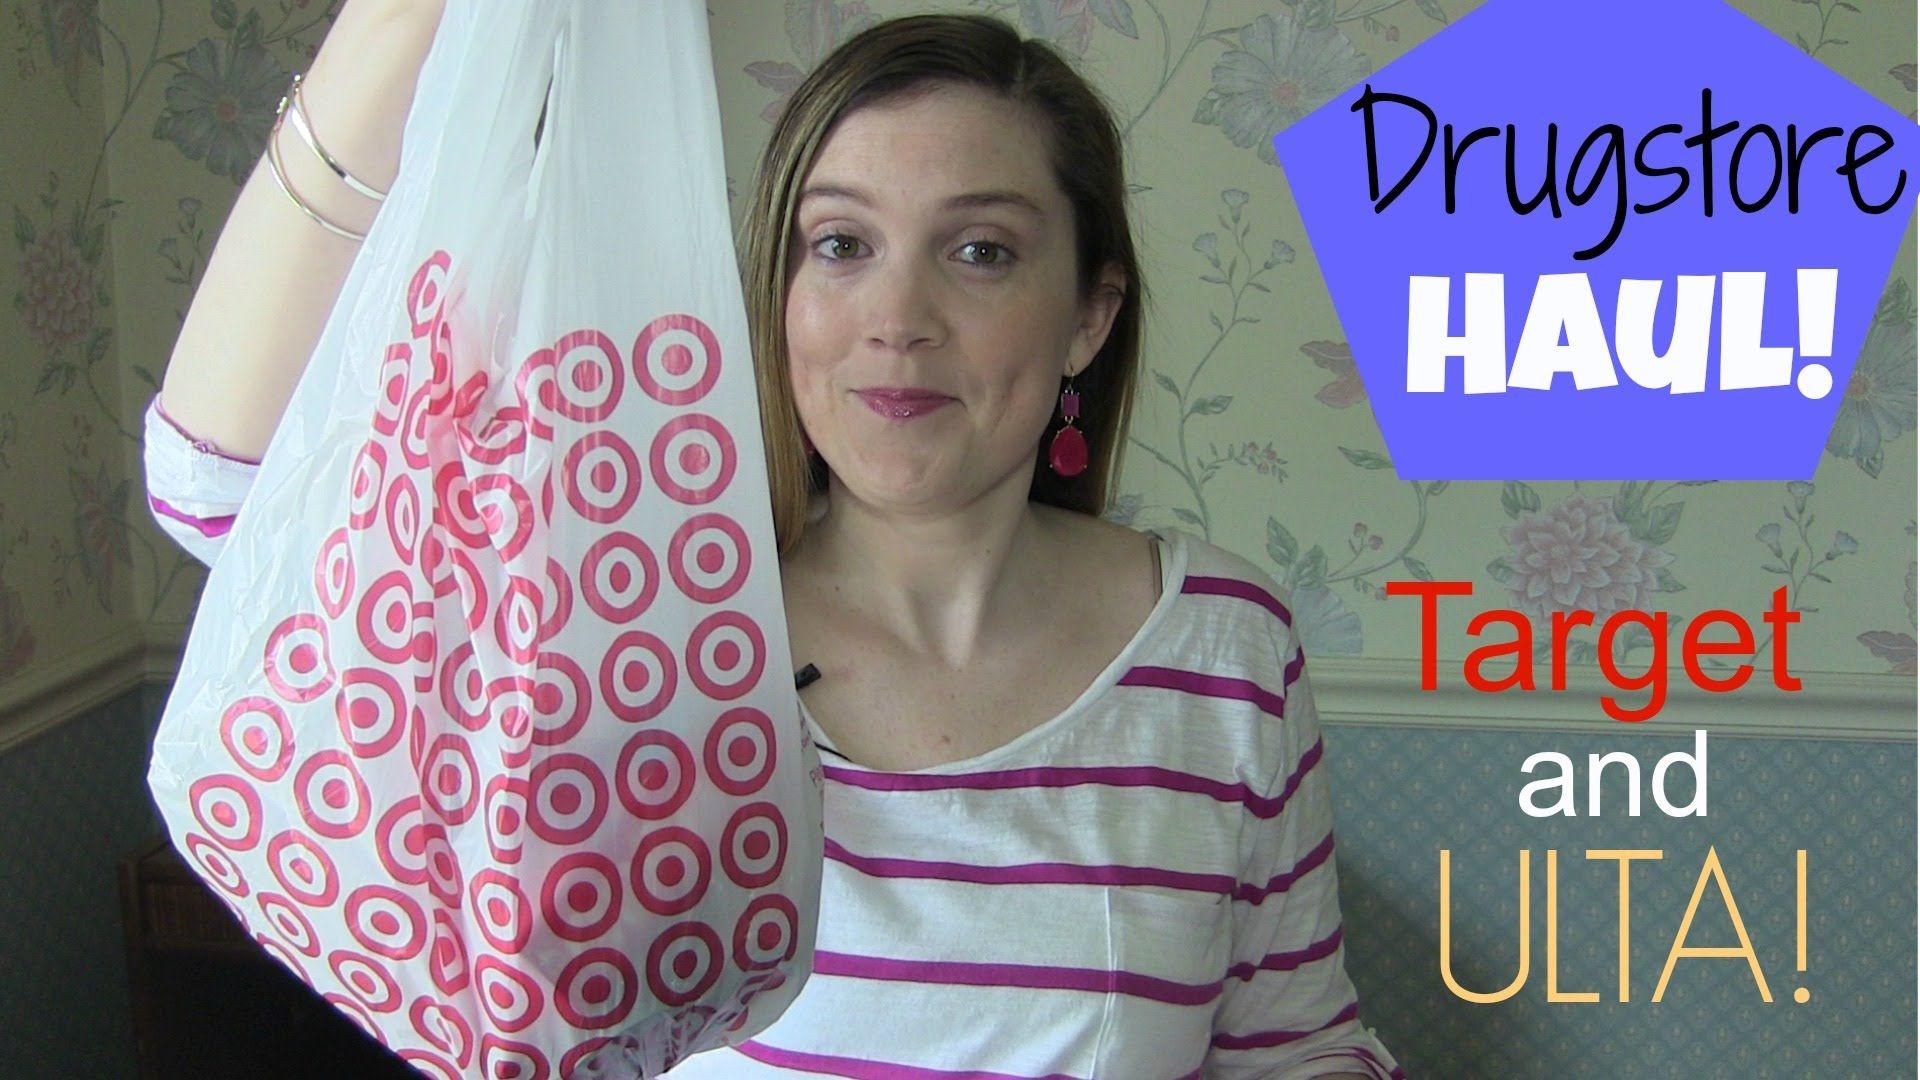 Drugstore Haul! - Target and Ulta